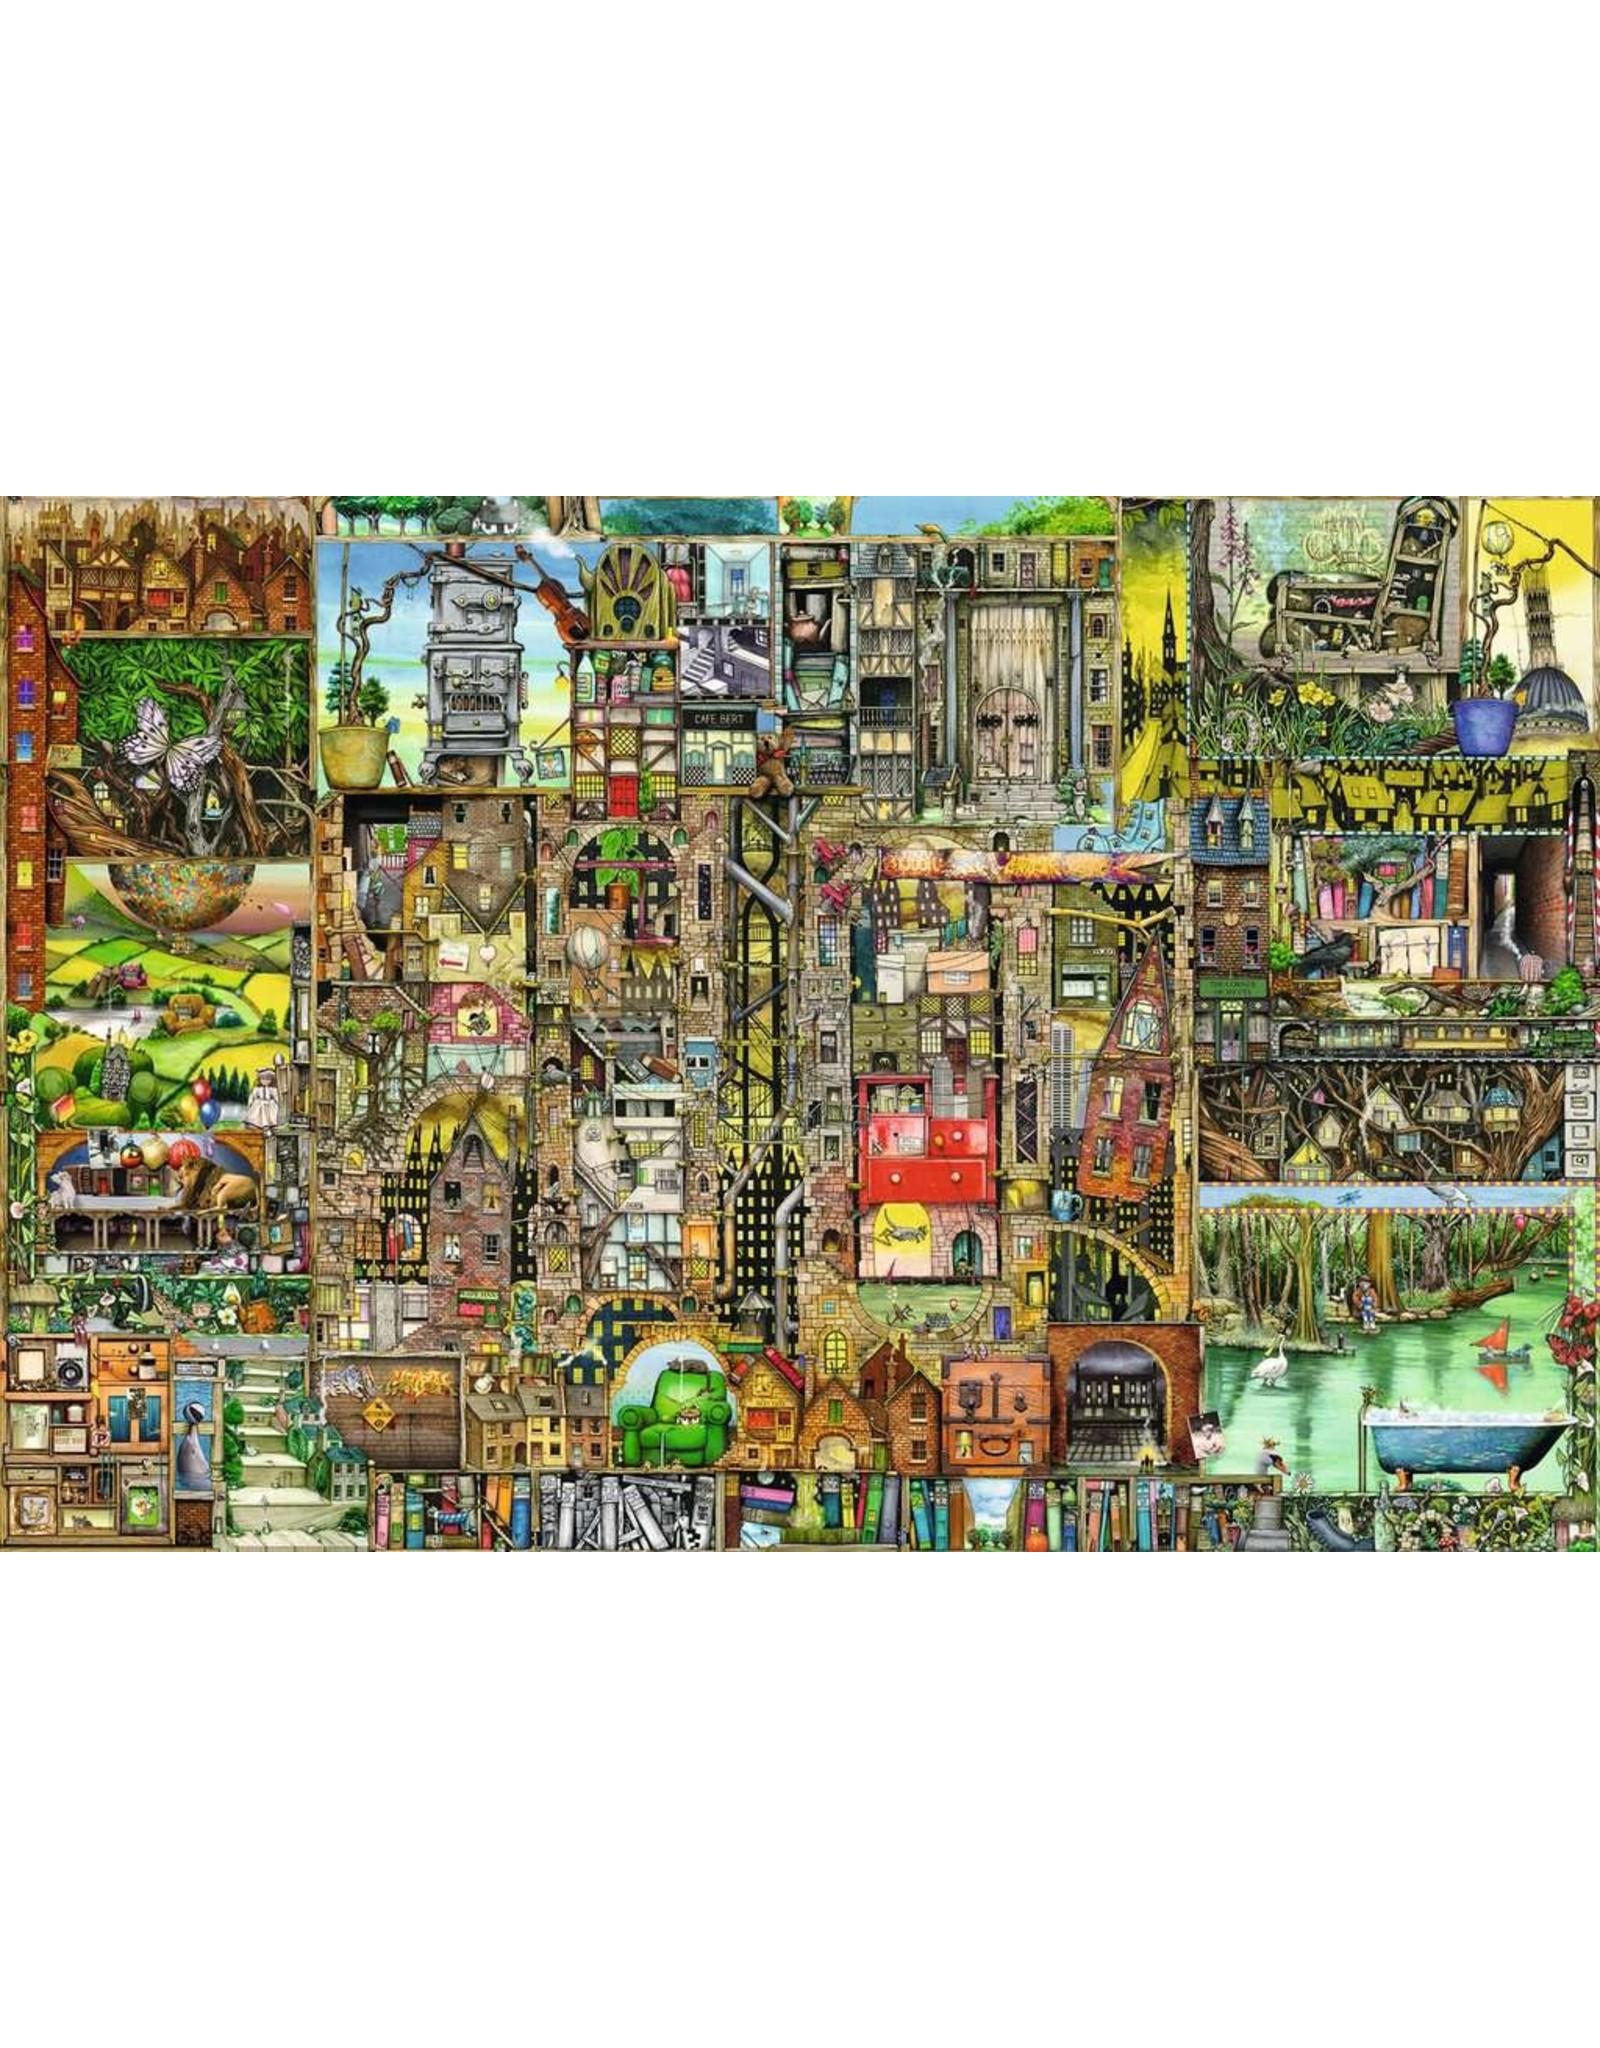 Ravensburger Colin Thompson: Bizarre Town 5000pc Puzzle